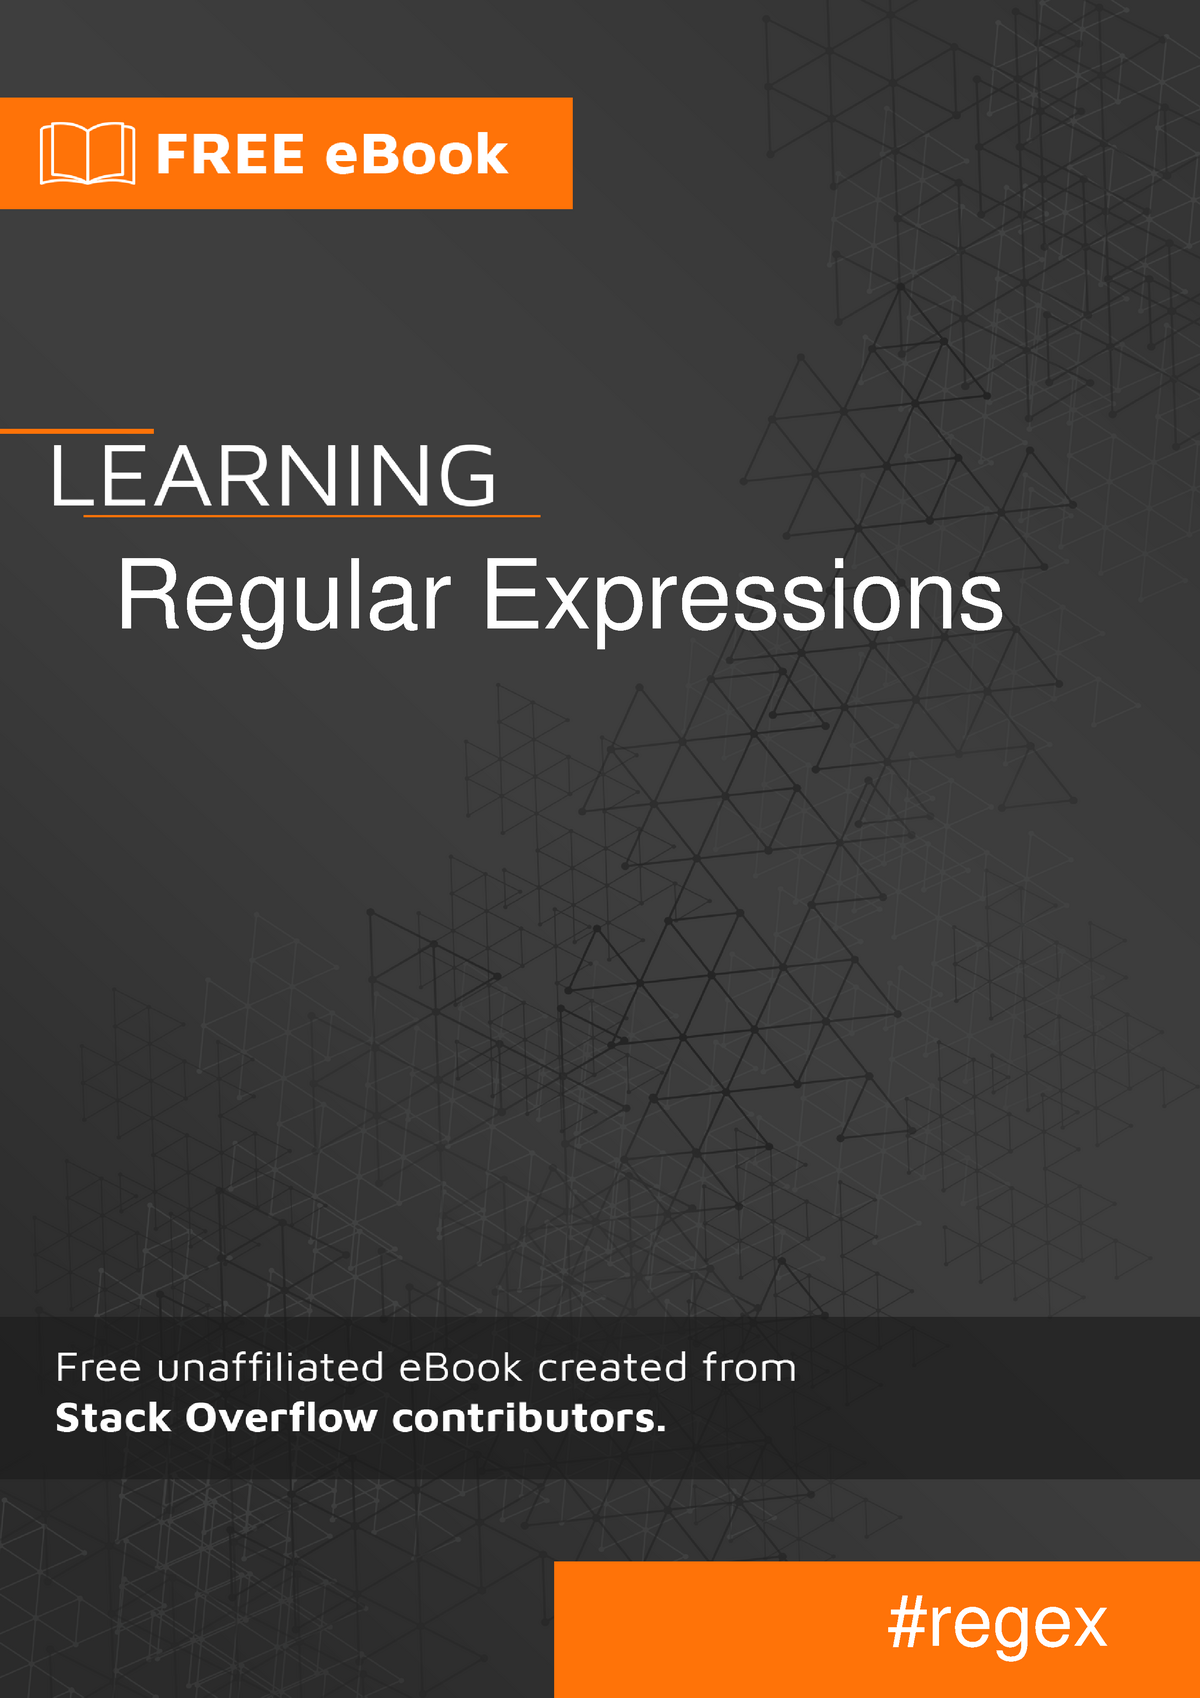 Regular-expressions - BA-CS: Bachelor of Computer Science